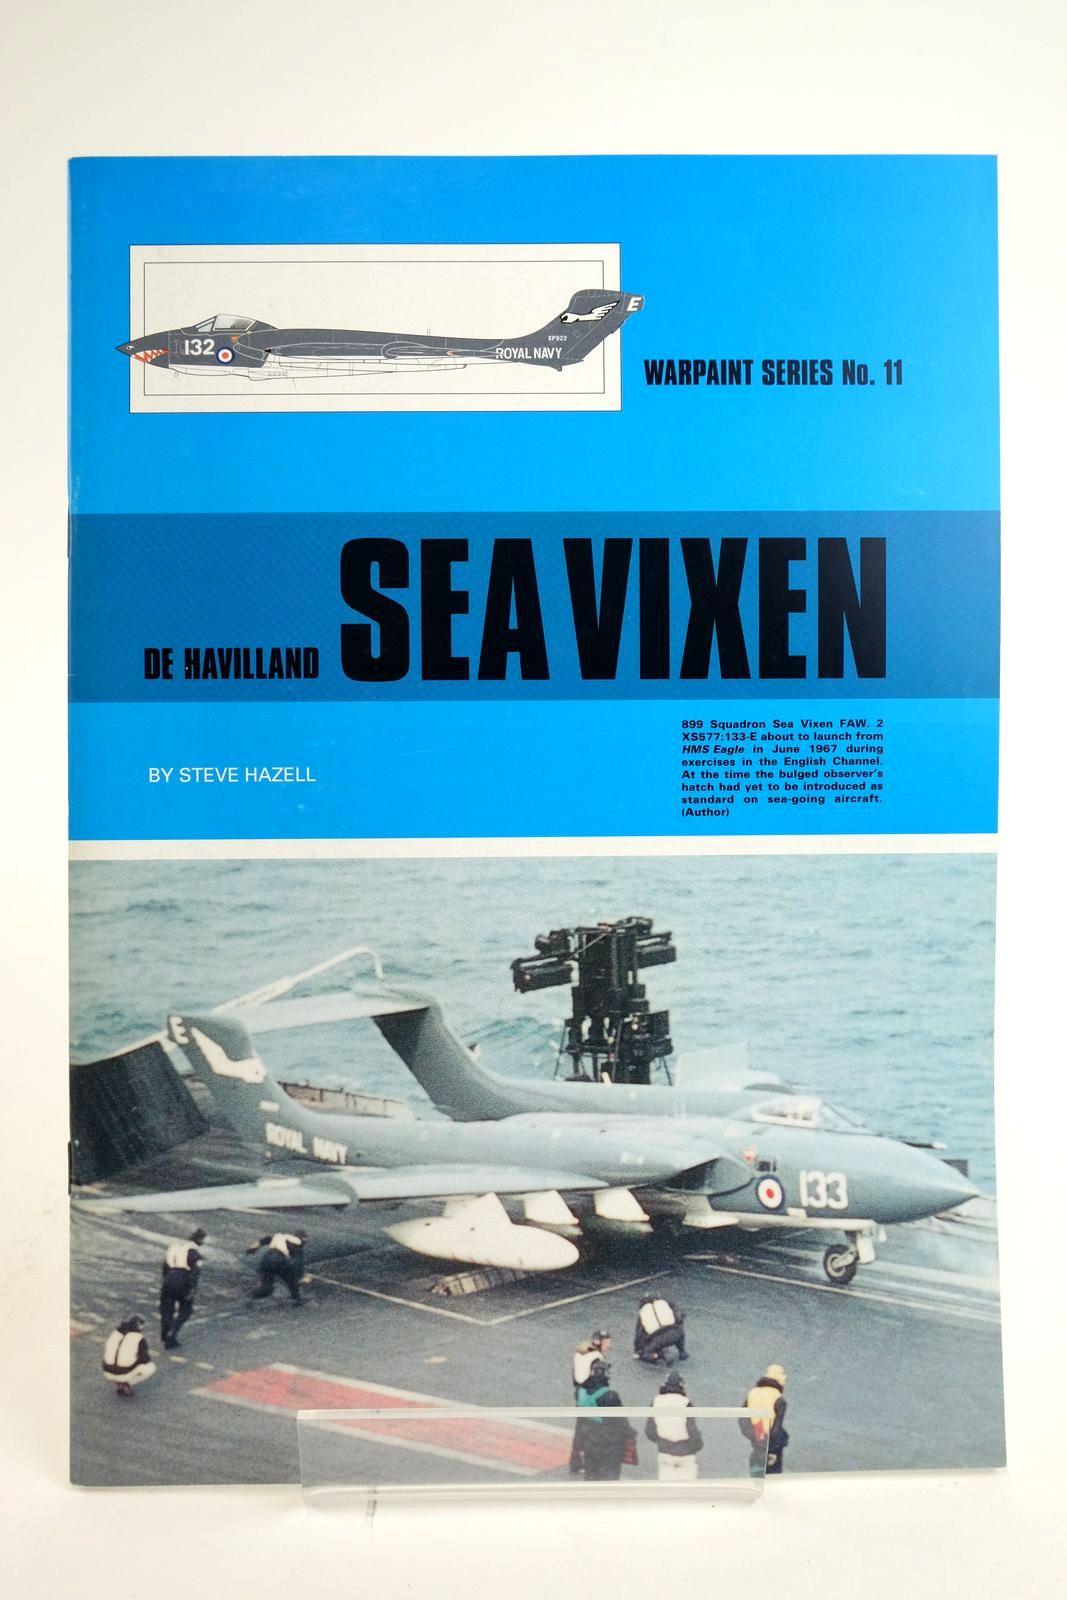 Photo of DE HAVILLAND SEA VIXEN written by Hazell, Steve published by Hall Park Books Ltd. (STOCK CODE: 2135103)  for sale by Stella & Rose's Books